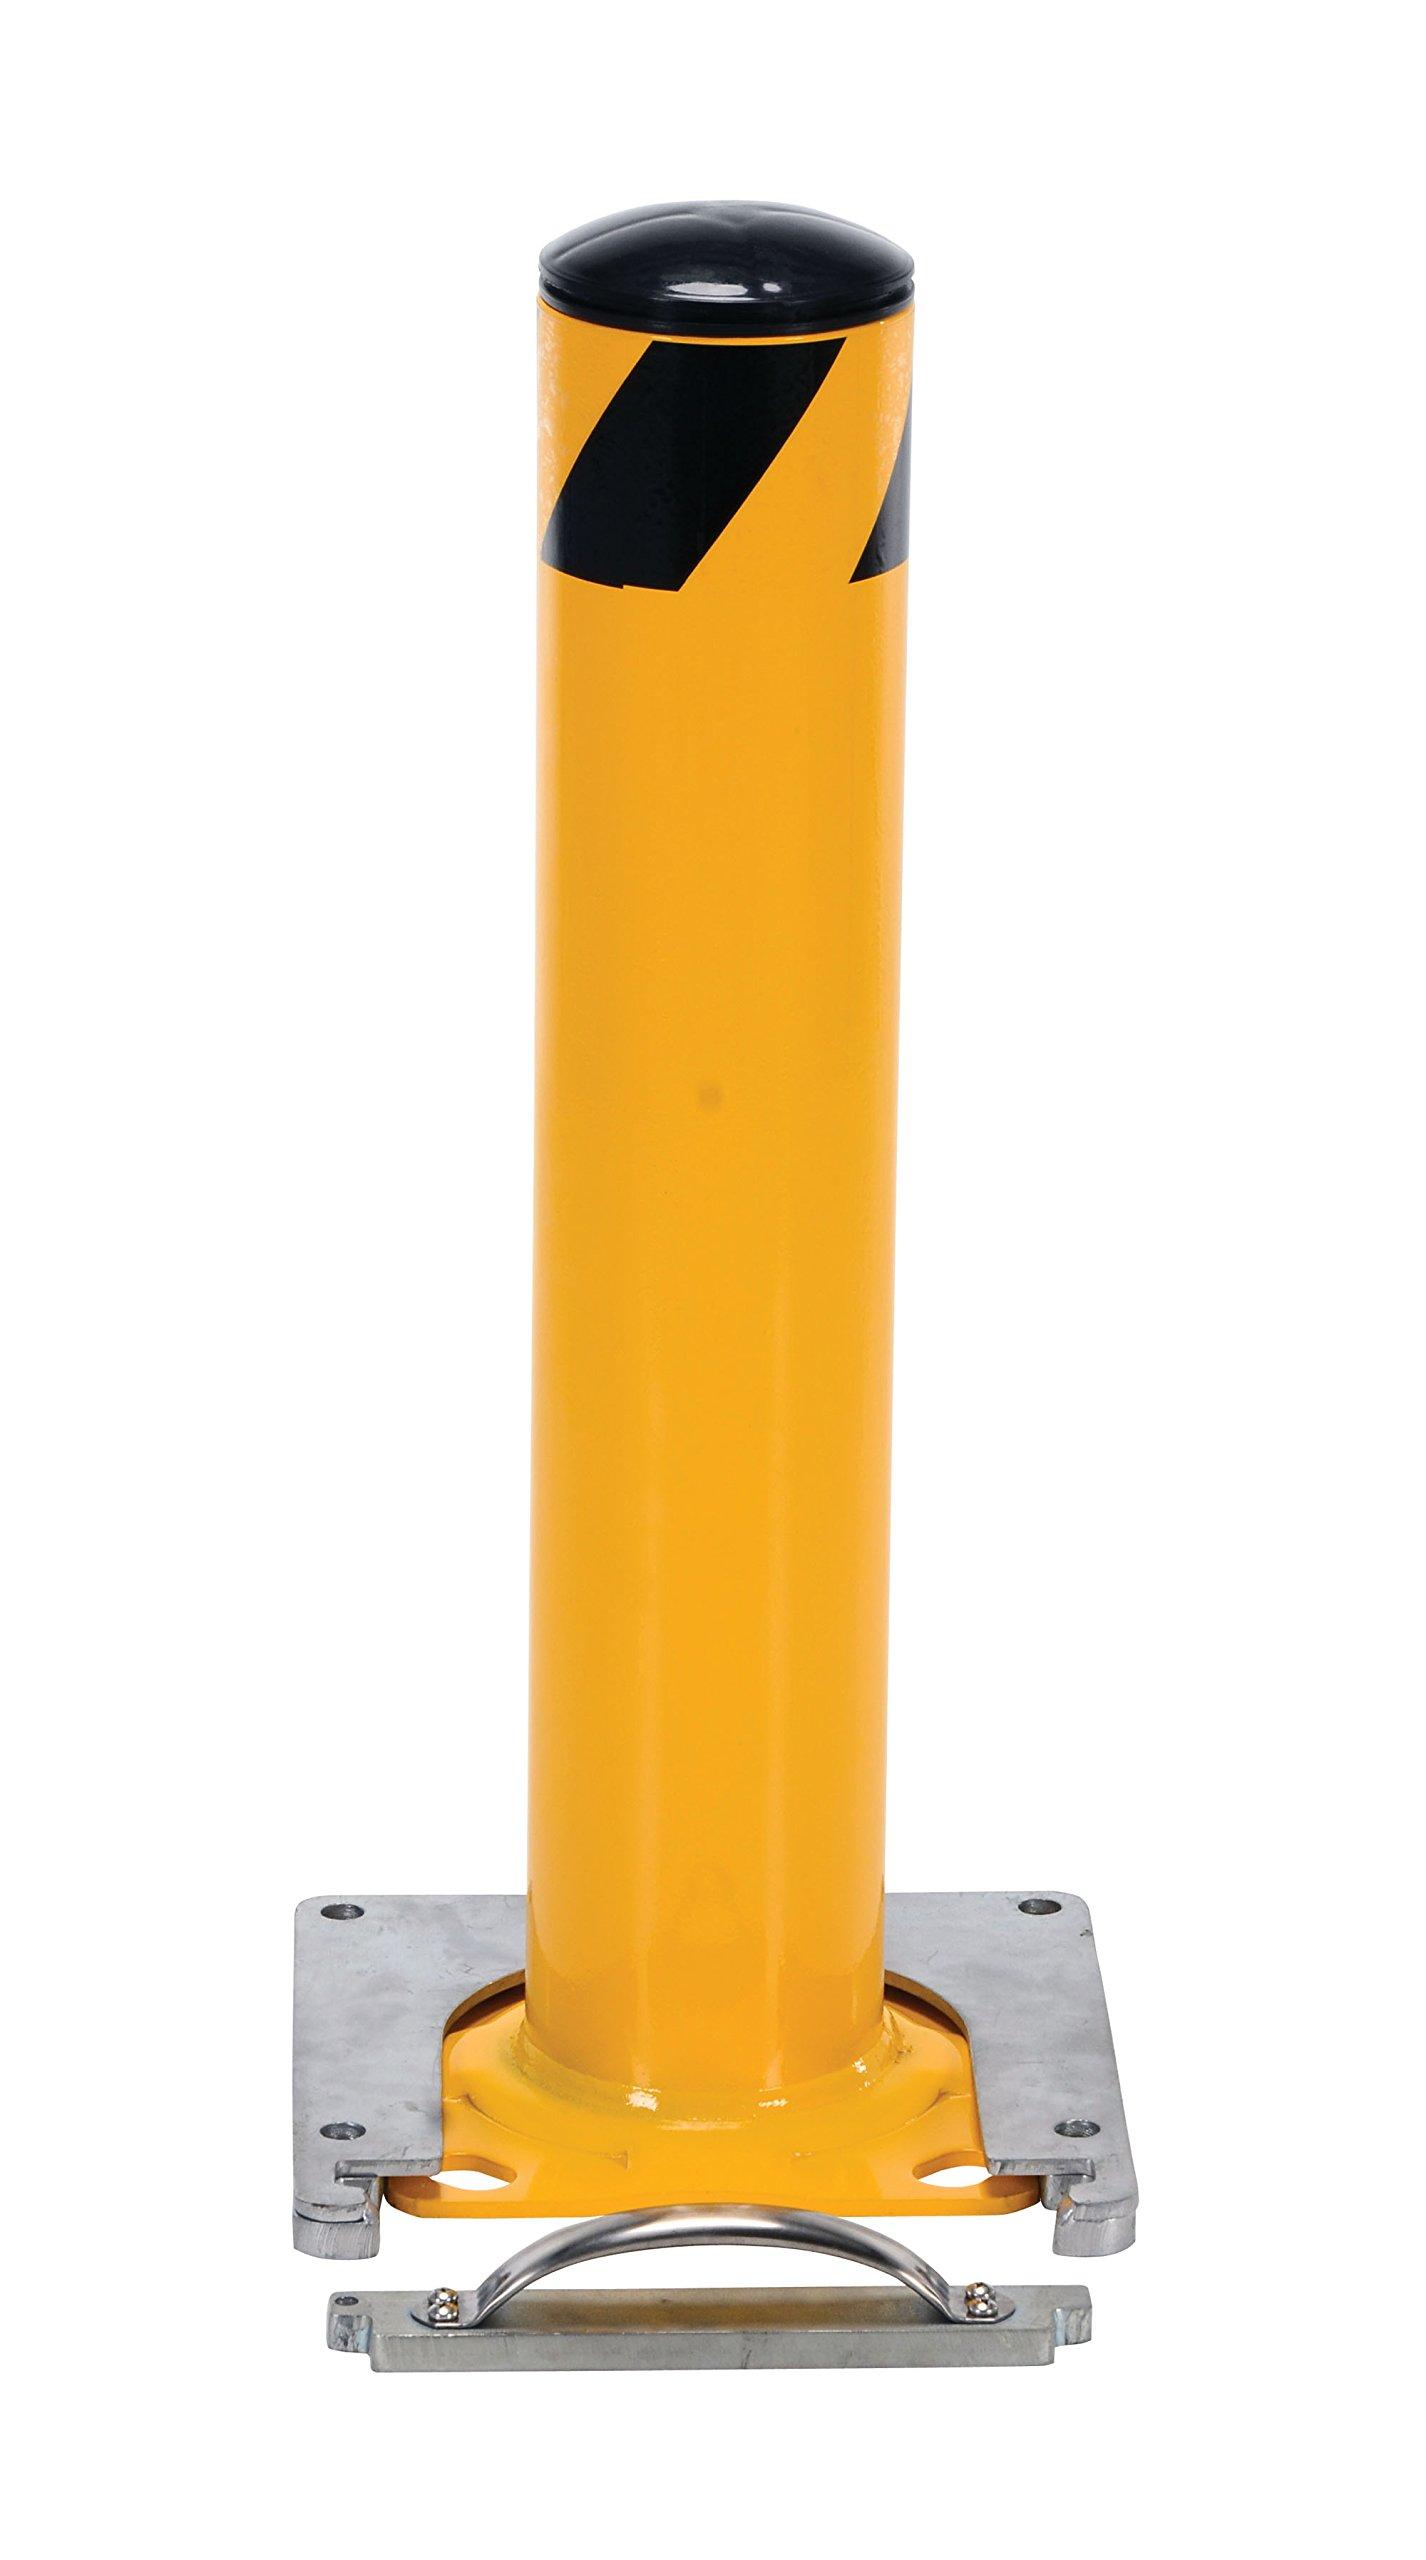 Vestil BOL-RF-24-4.5 Surface Mounted Removable Steel Pipe Safety Bollard, 4-1/2'' OD, 24'' Height by Vestil (Image #4)